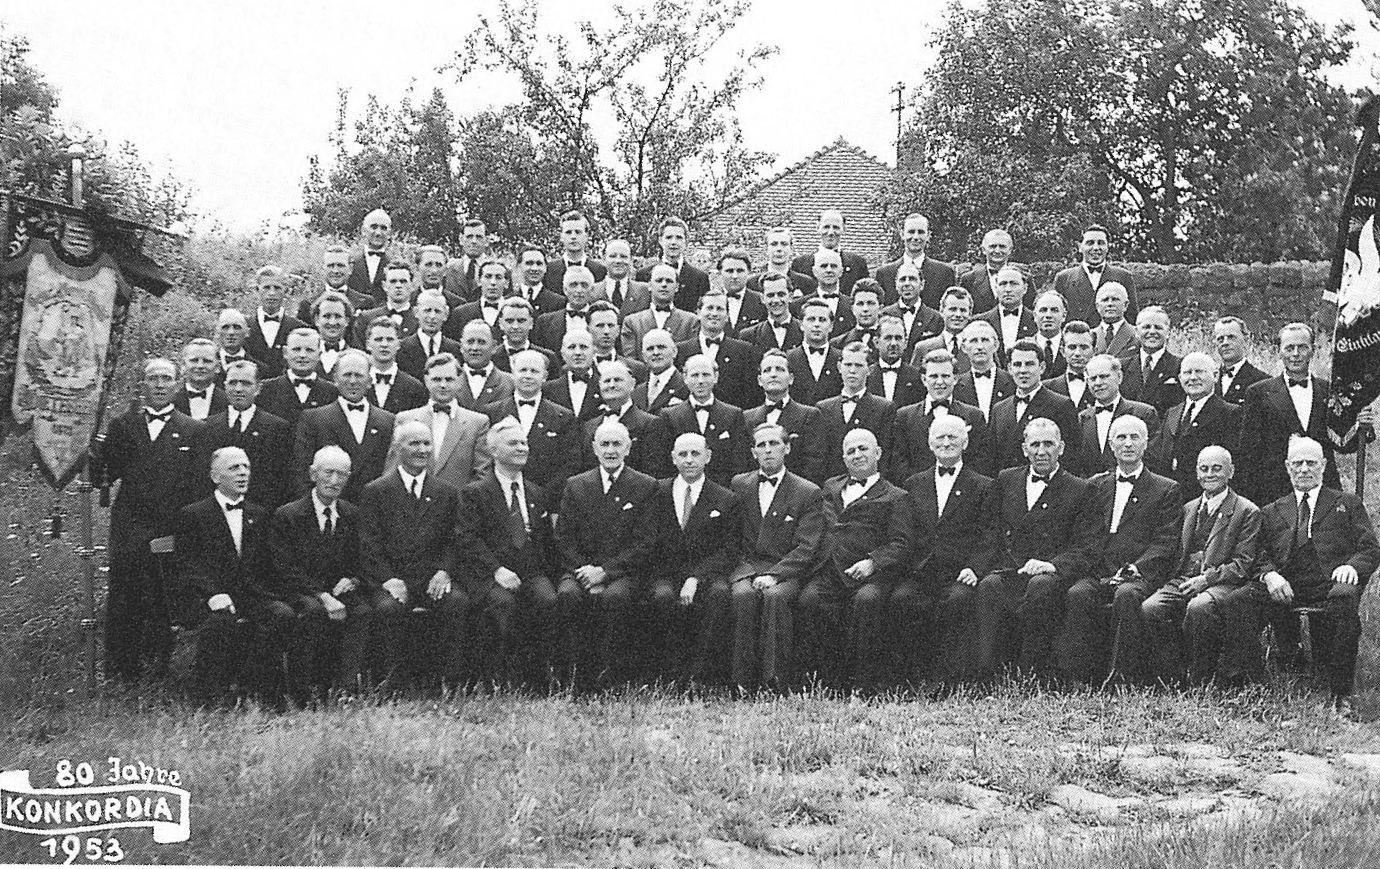 Concordia 1953